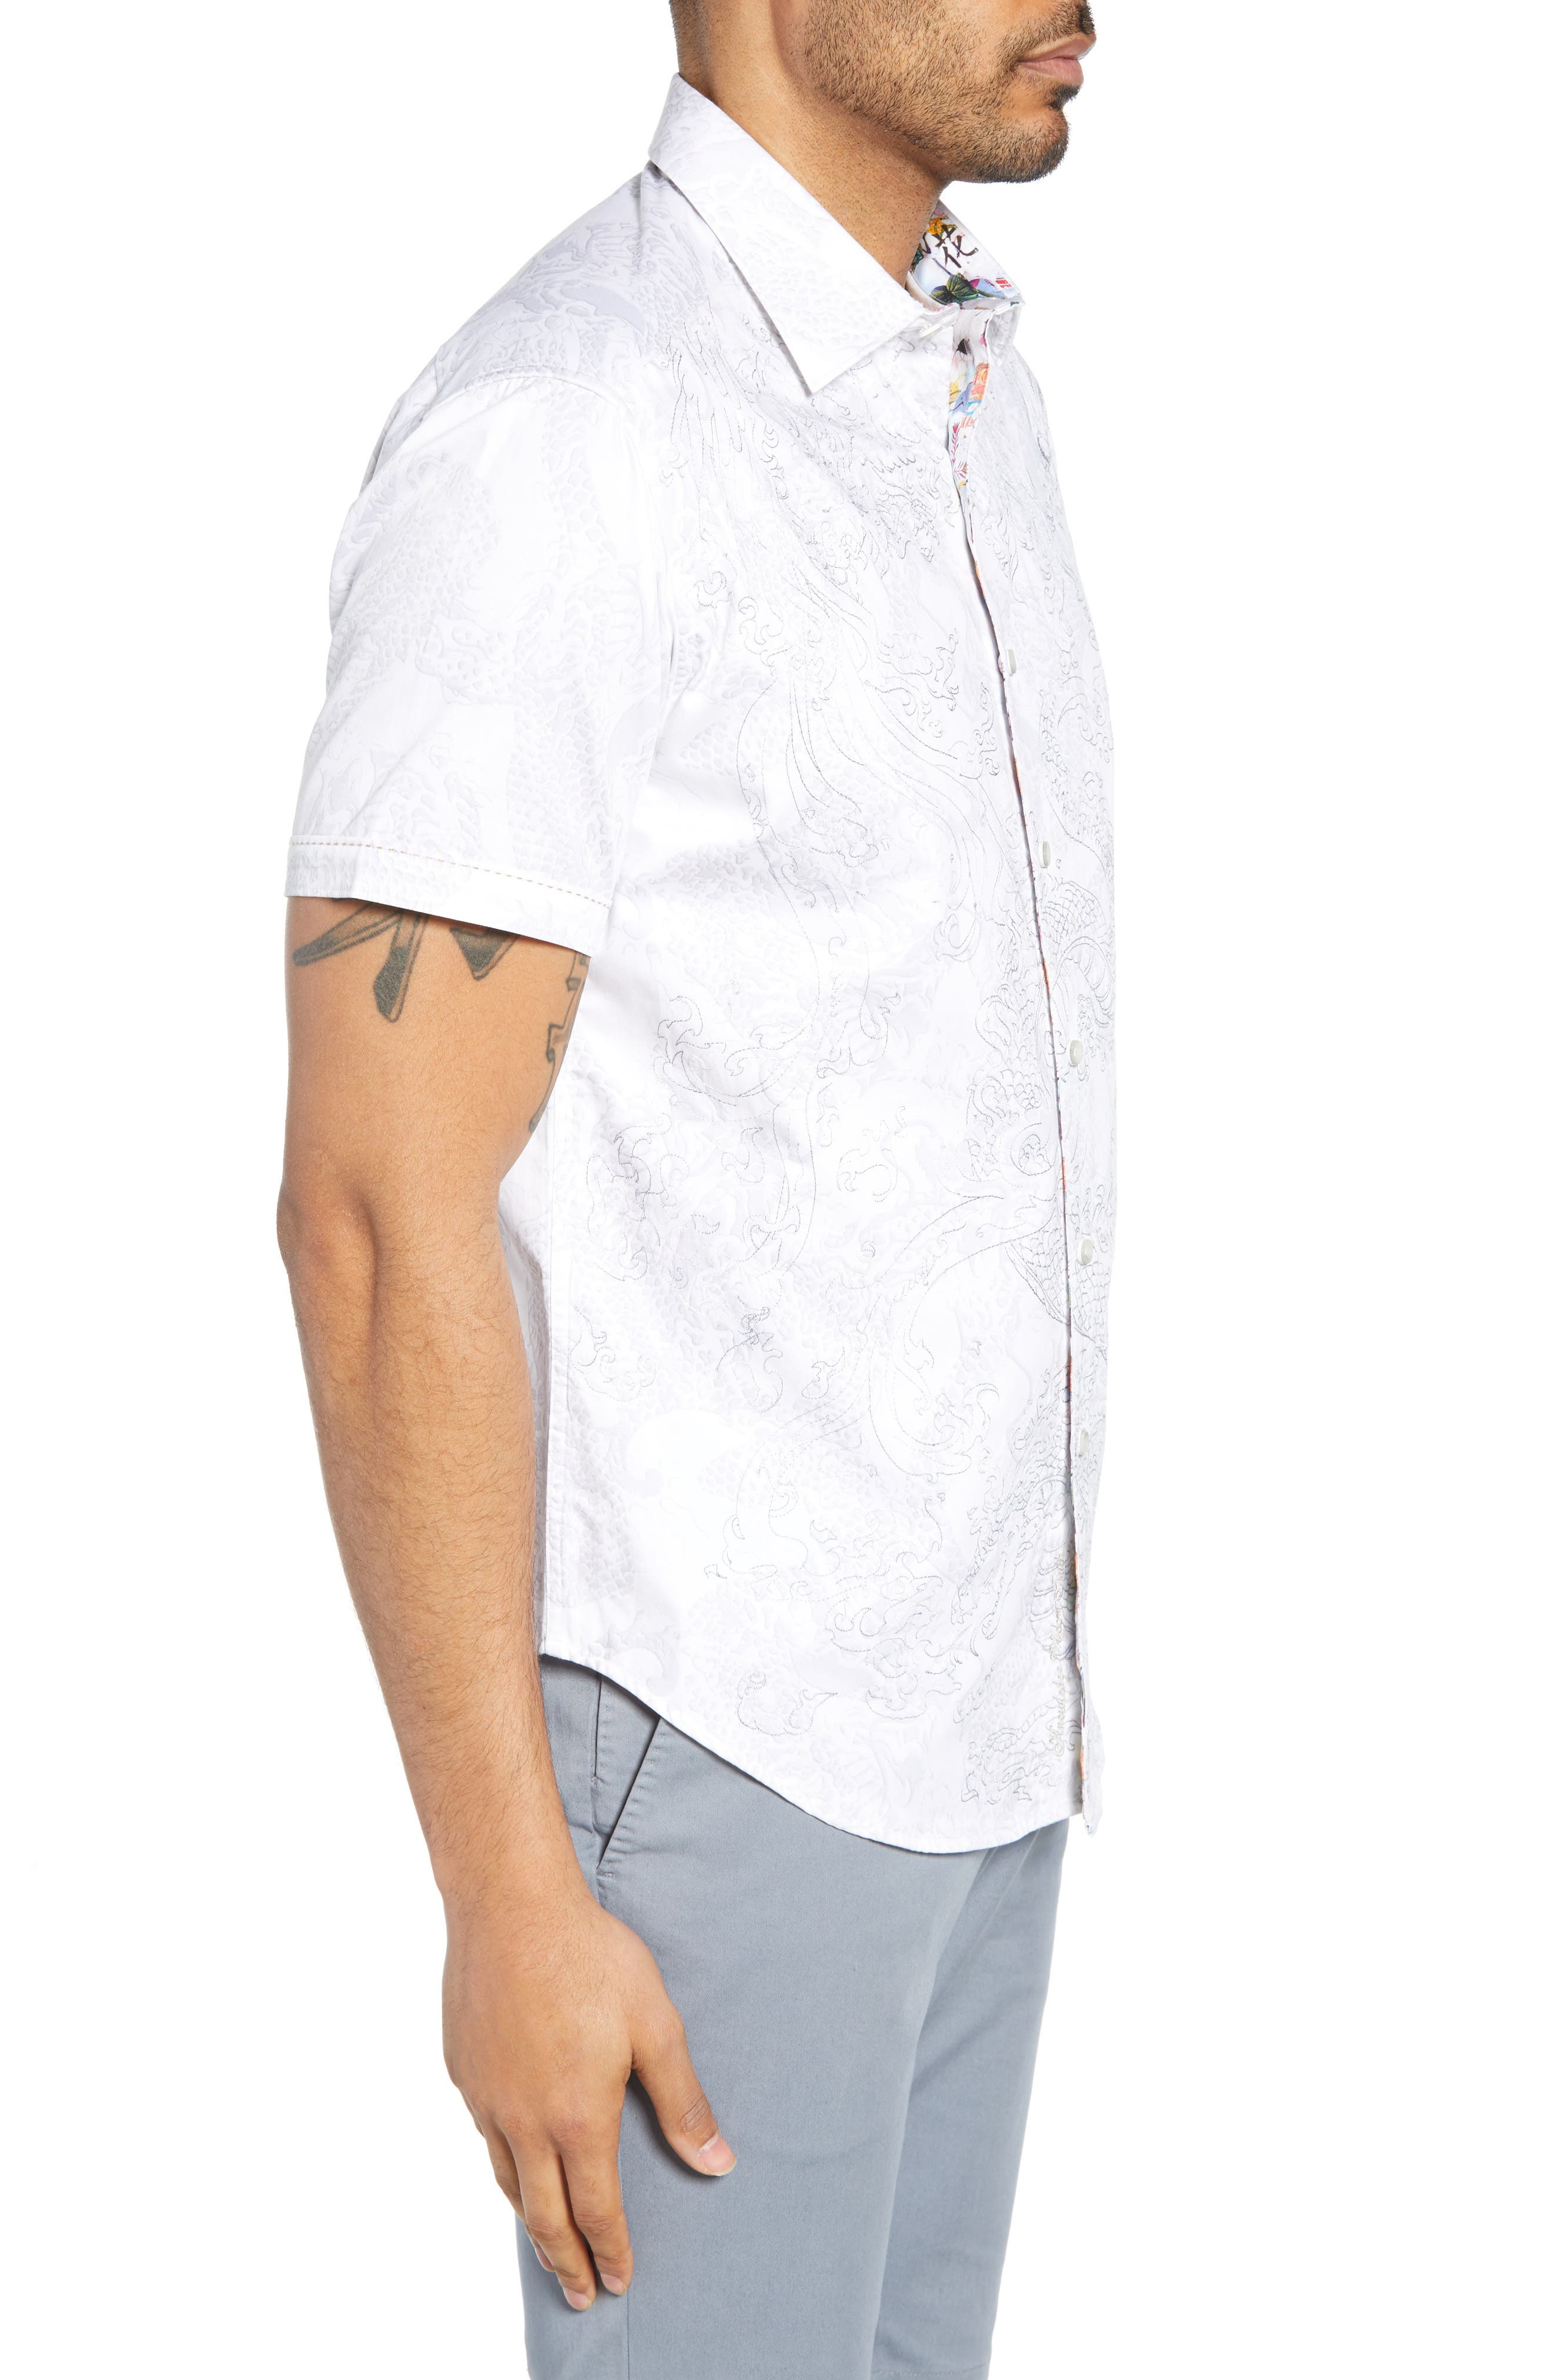 Robert Graham T-shirts Dragon Fire Classic Fit Cotton Shirt